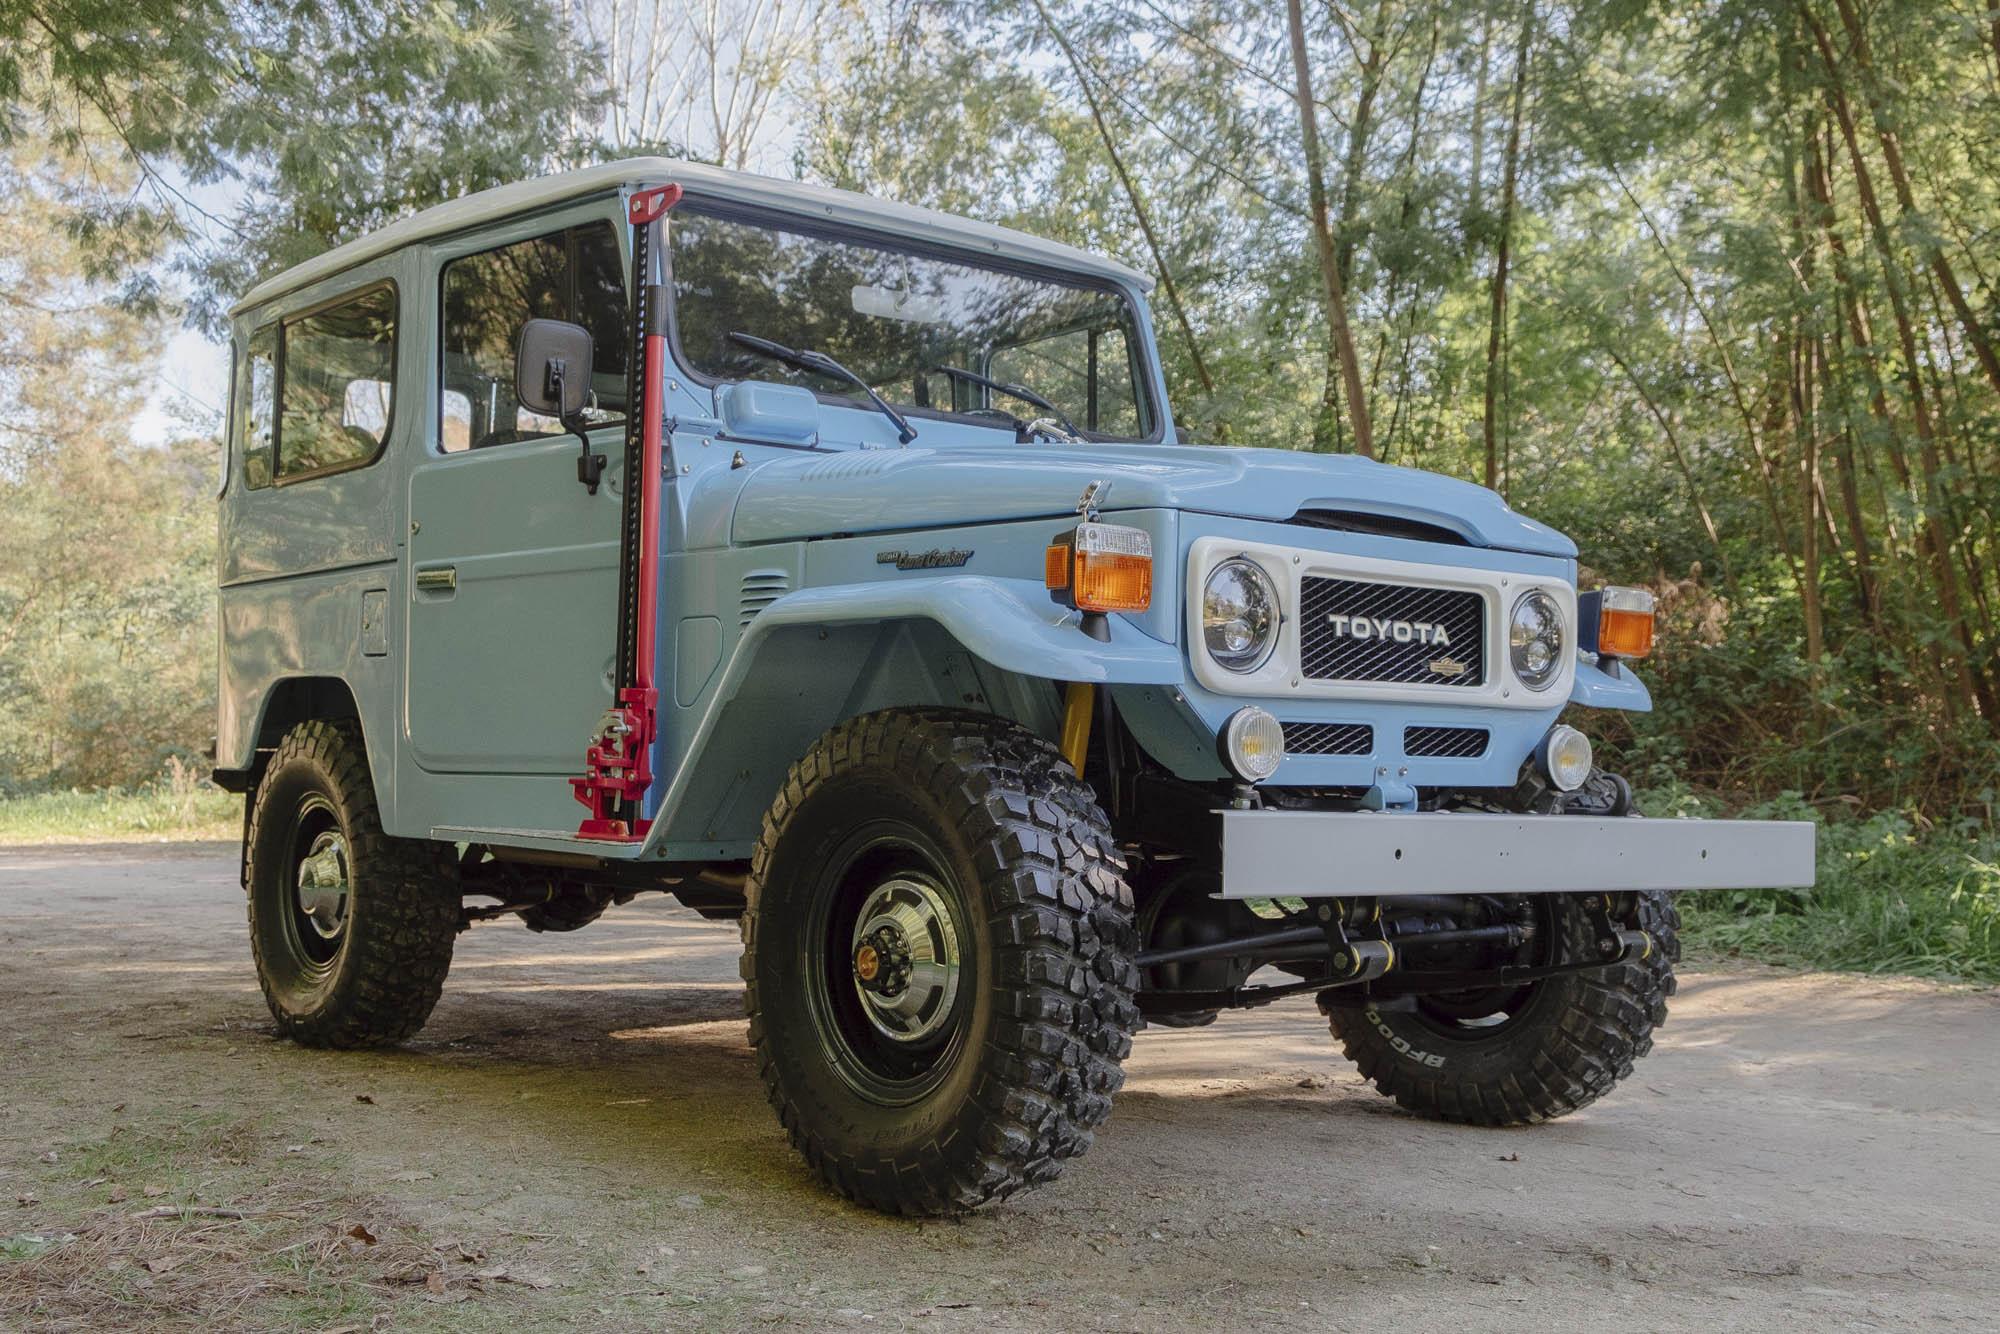 Toyota FJ Land Cruiser Vintage Prices Refurbished Models